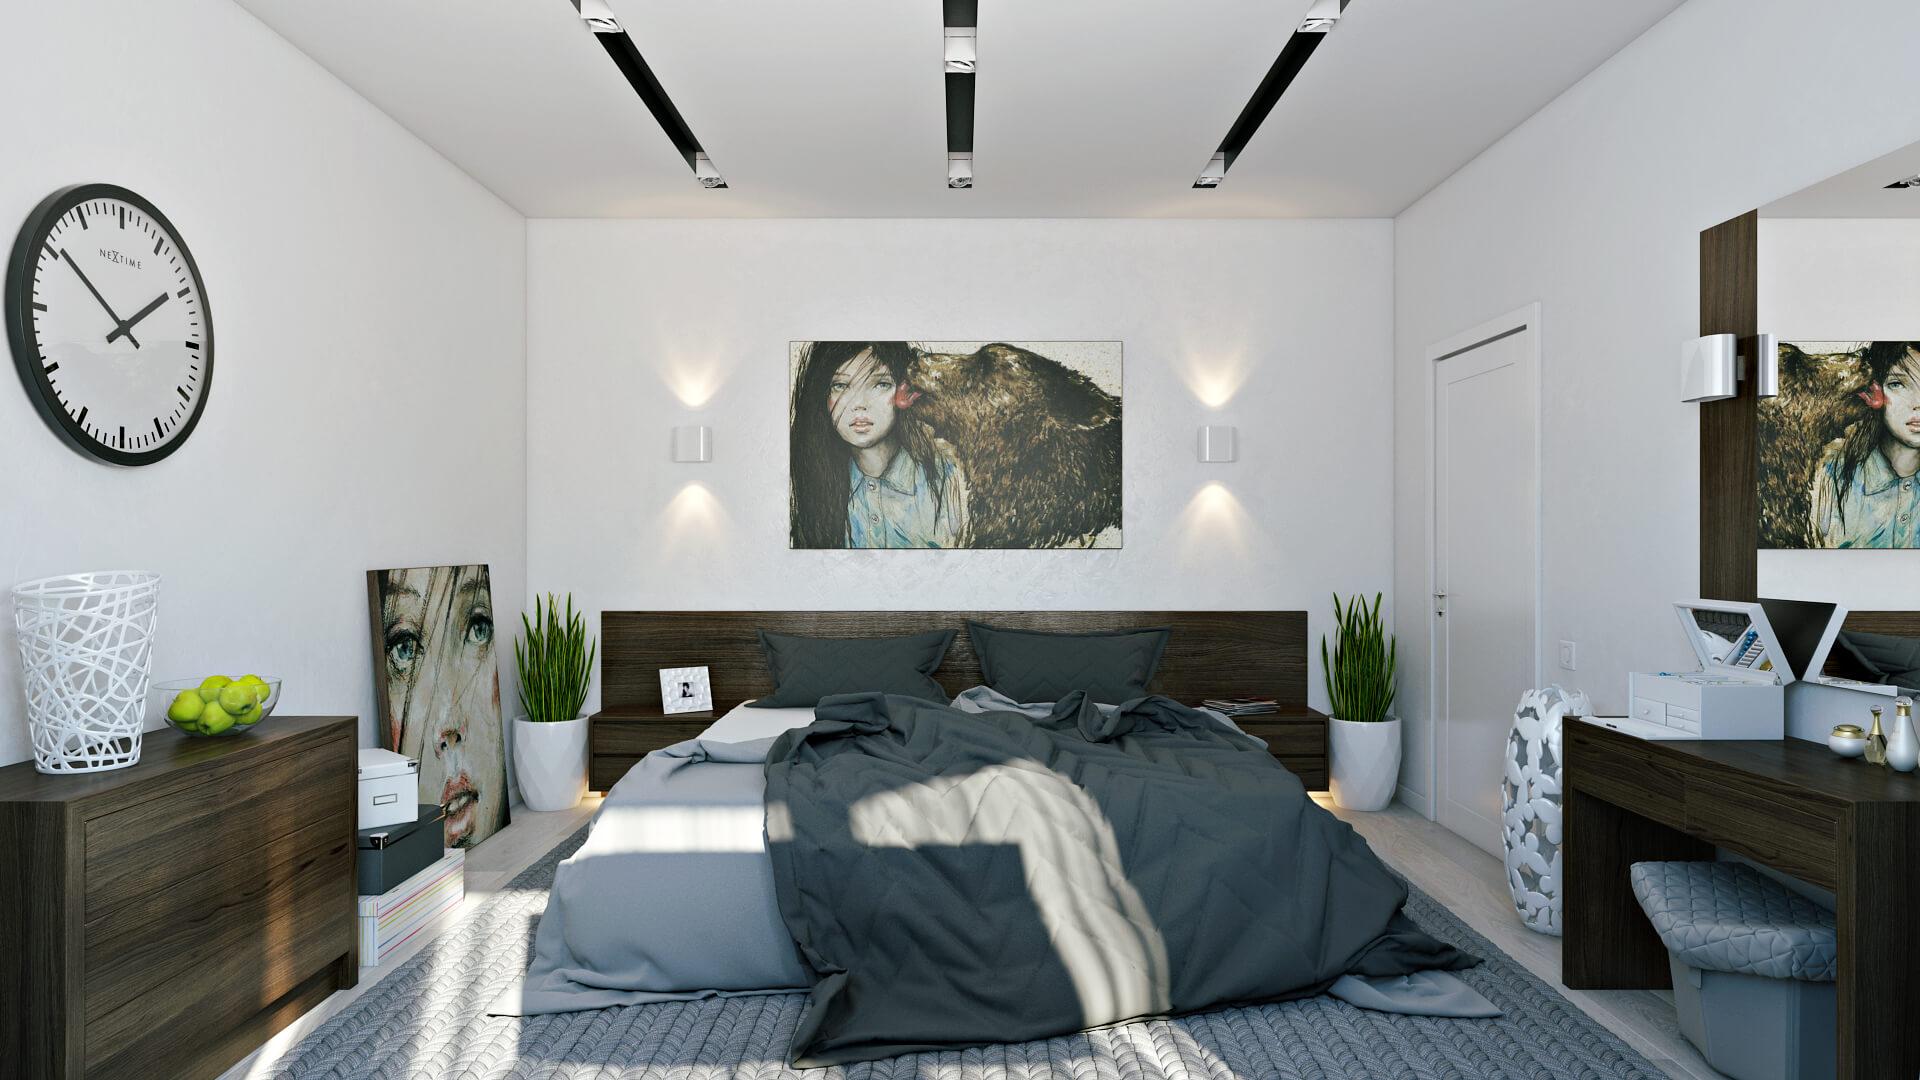 Modern bedroom decoration in white color